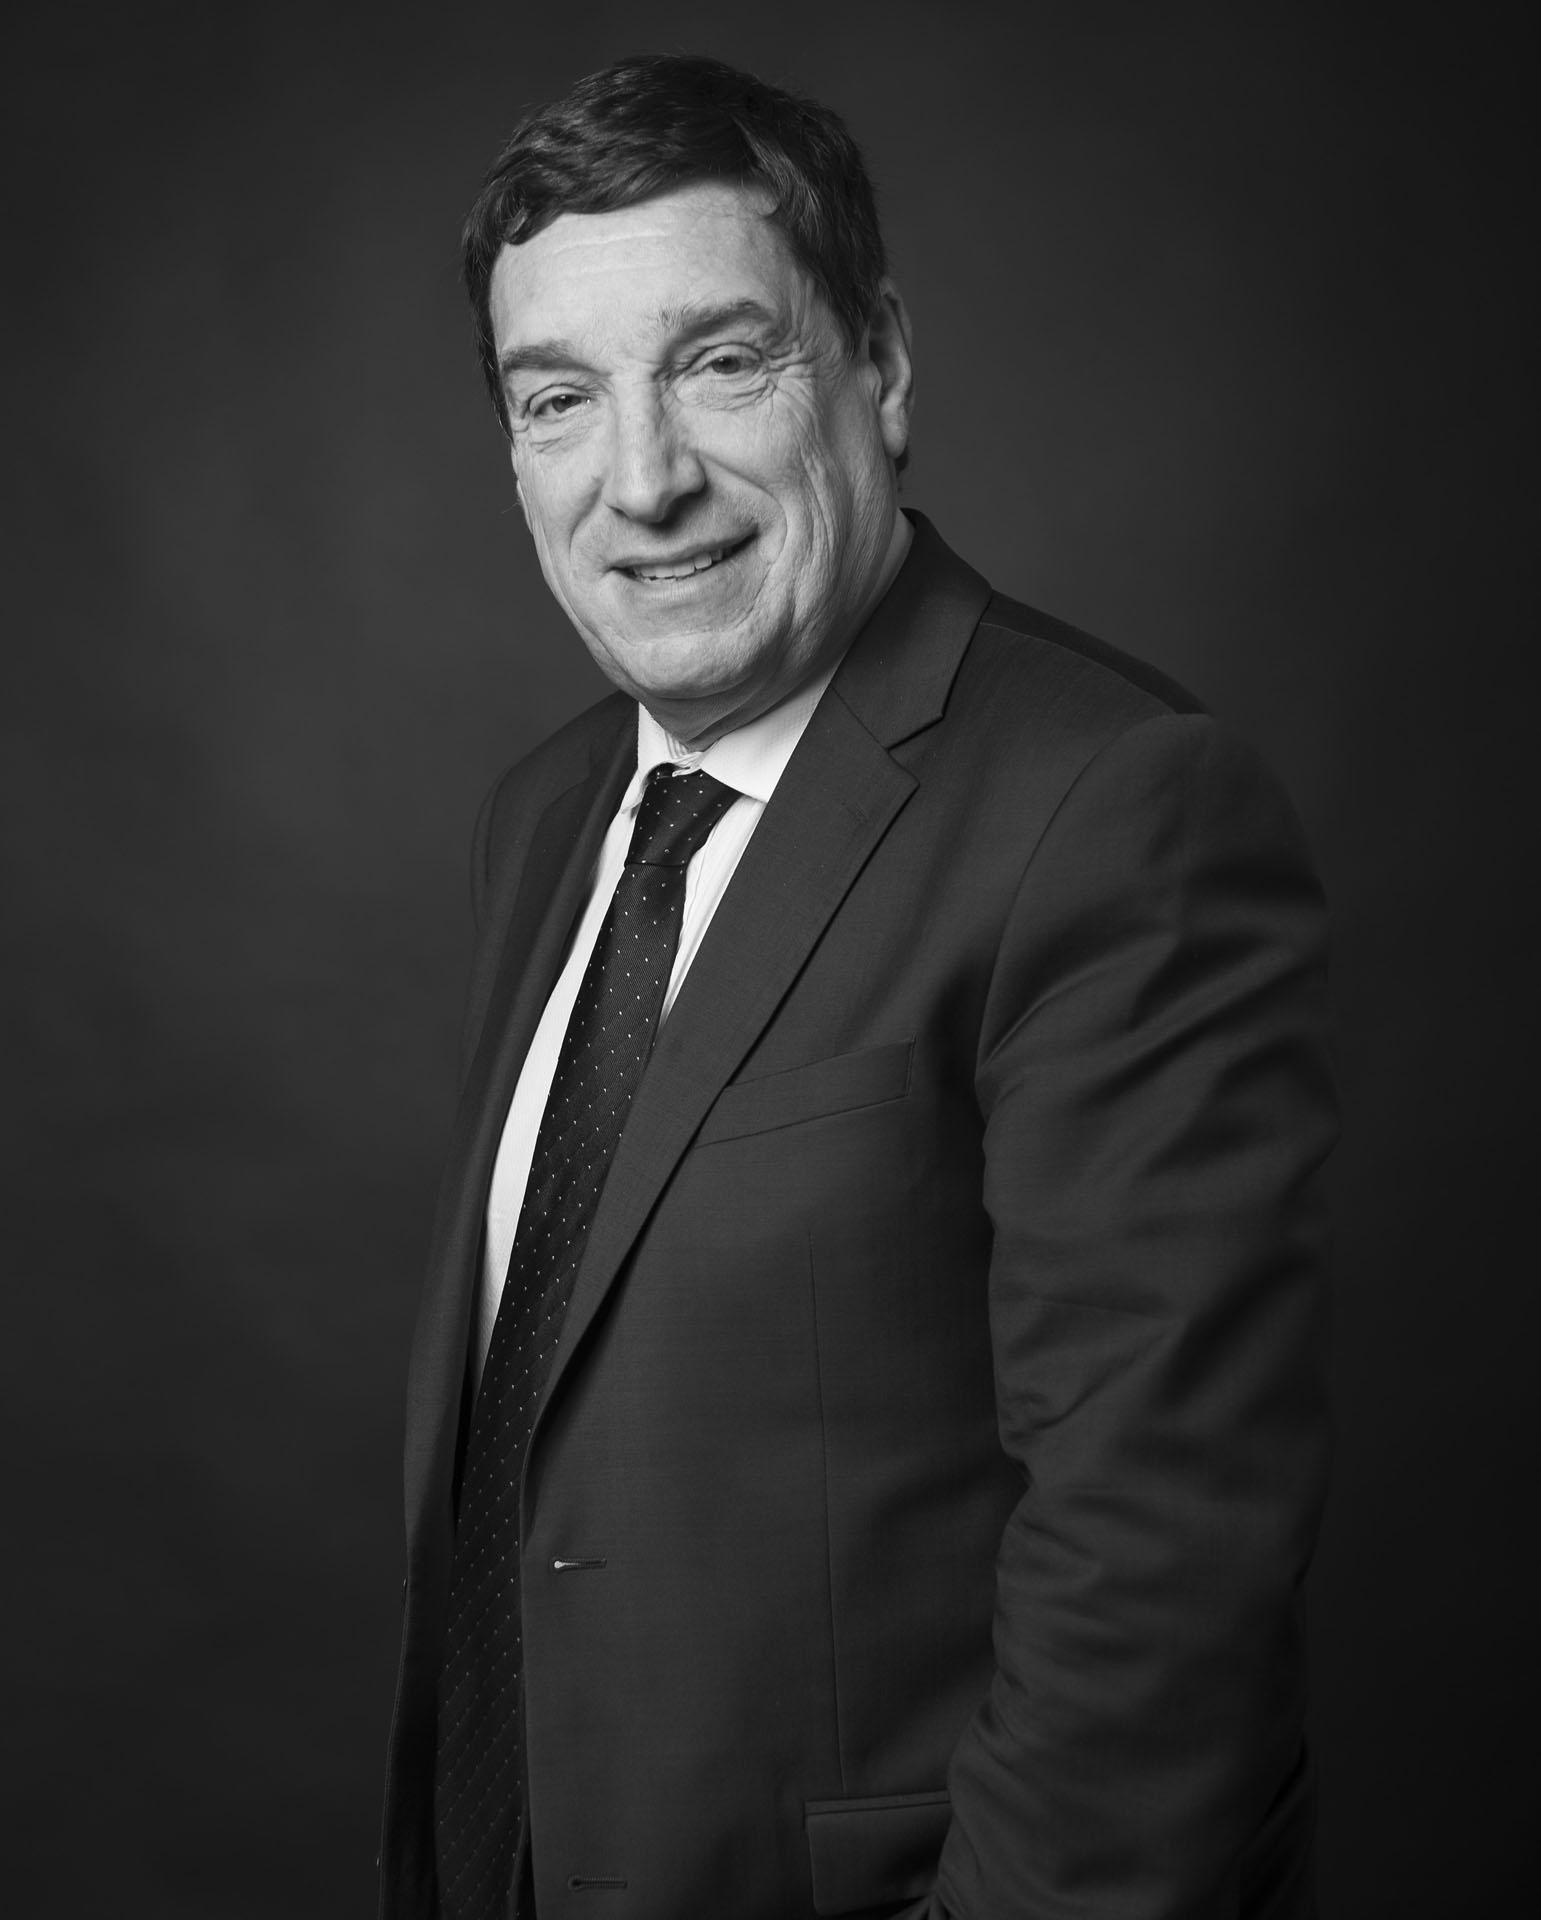 Portrait du CA du Club de la Presse Marseille Provence Alpes © Claude Almodovar